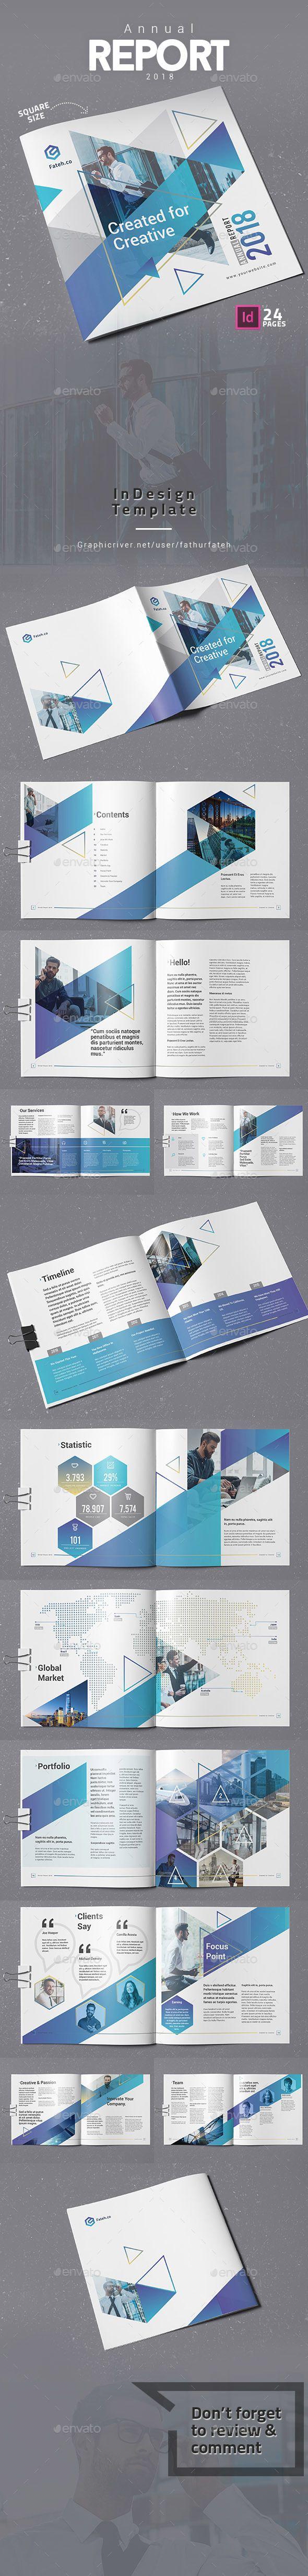 #Annual Report 2018 Square - #Corporate #Brochures